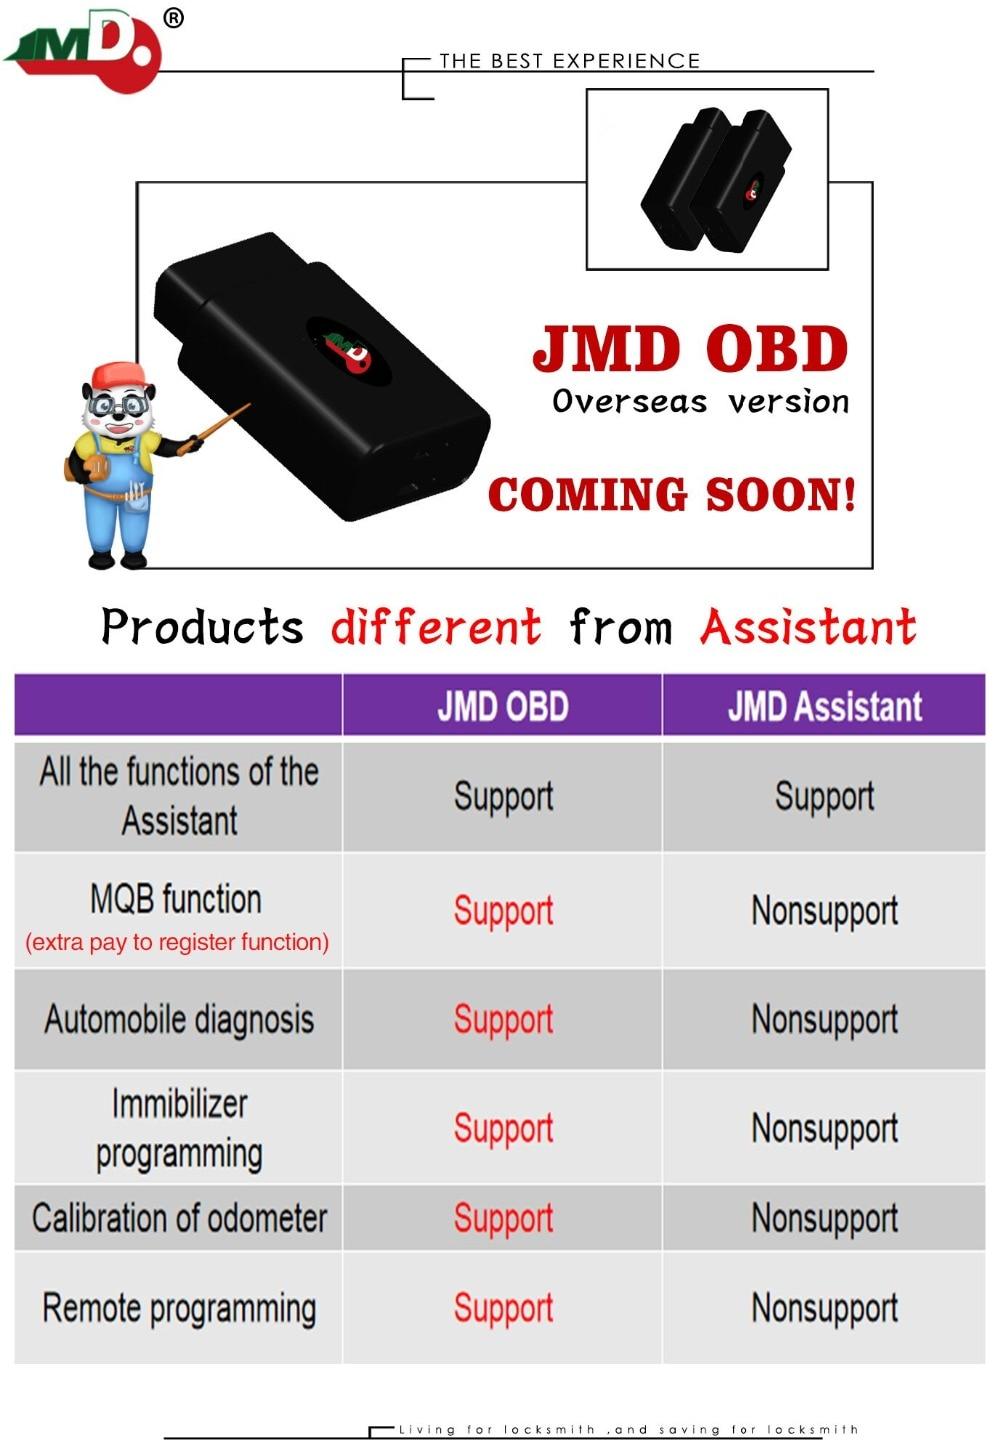 JMDOBD